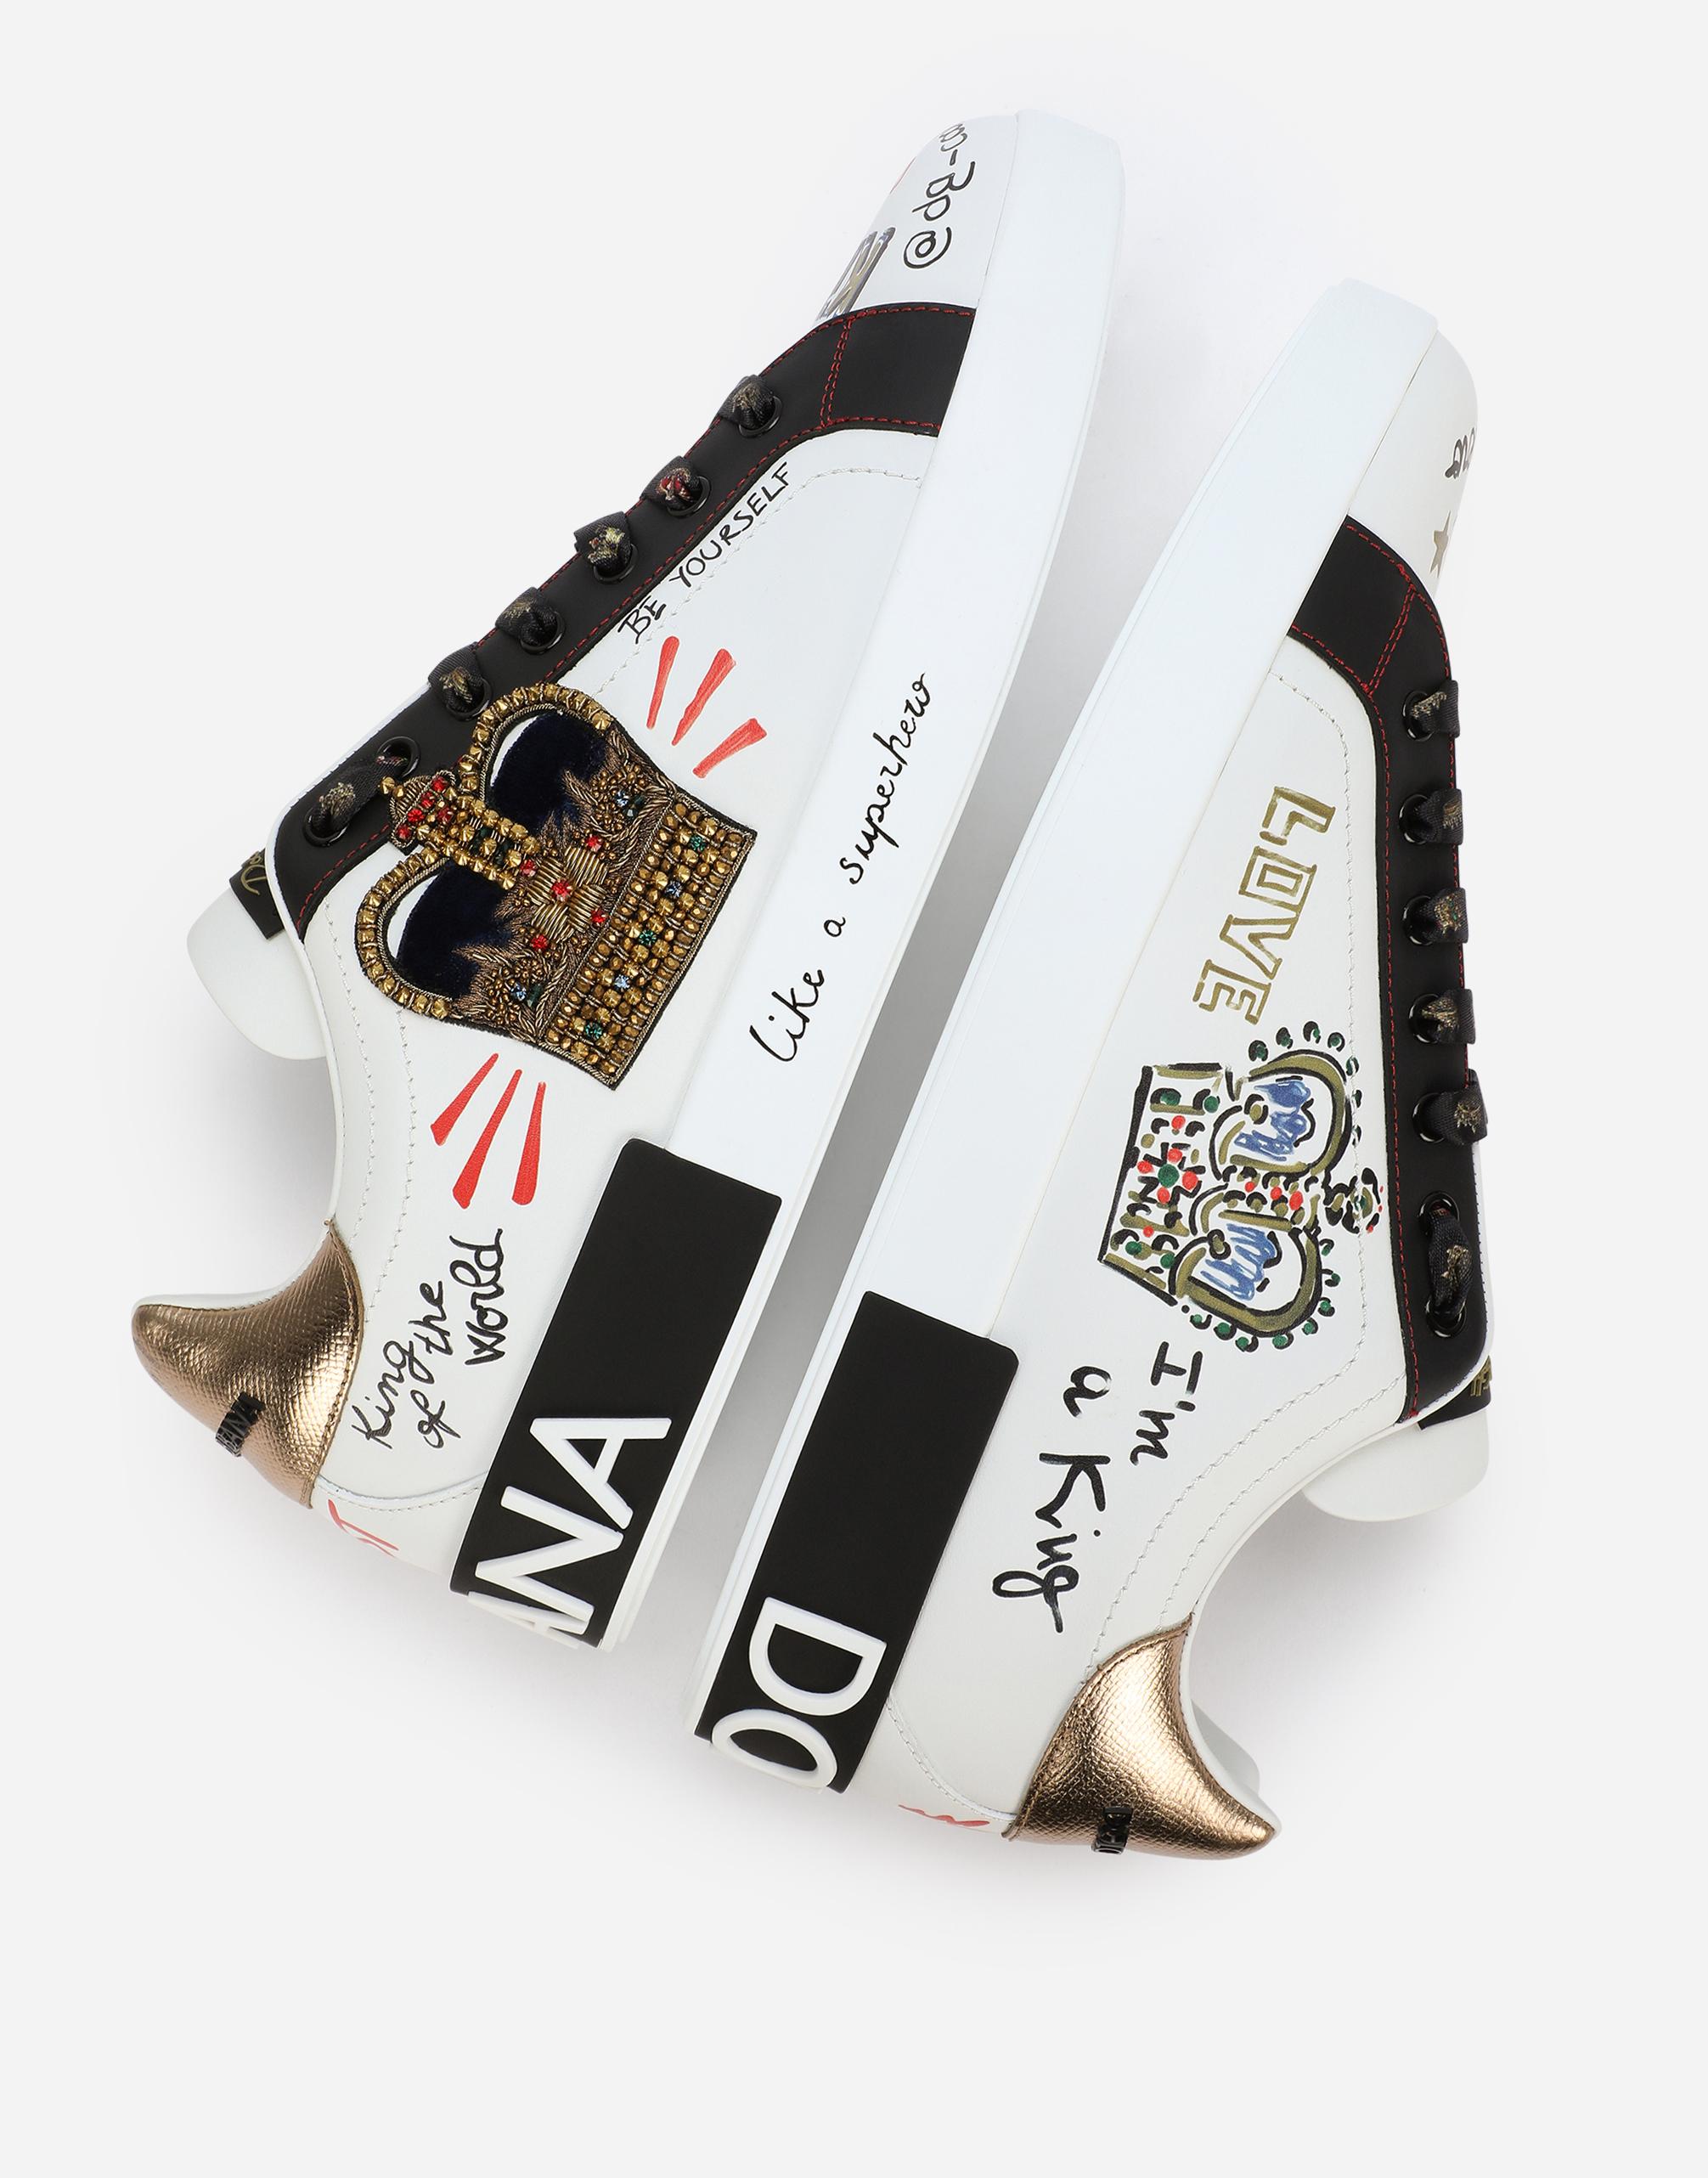 Dolce & Gabbana PORTOFINO SNEAKERS IN PRINTED NAPPA CALFSKIN WITH PATCH